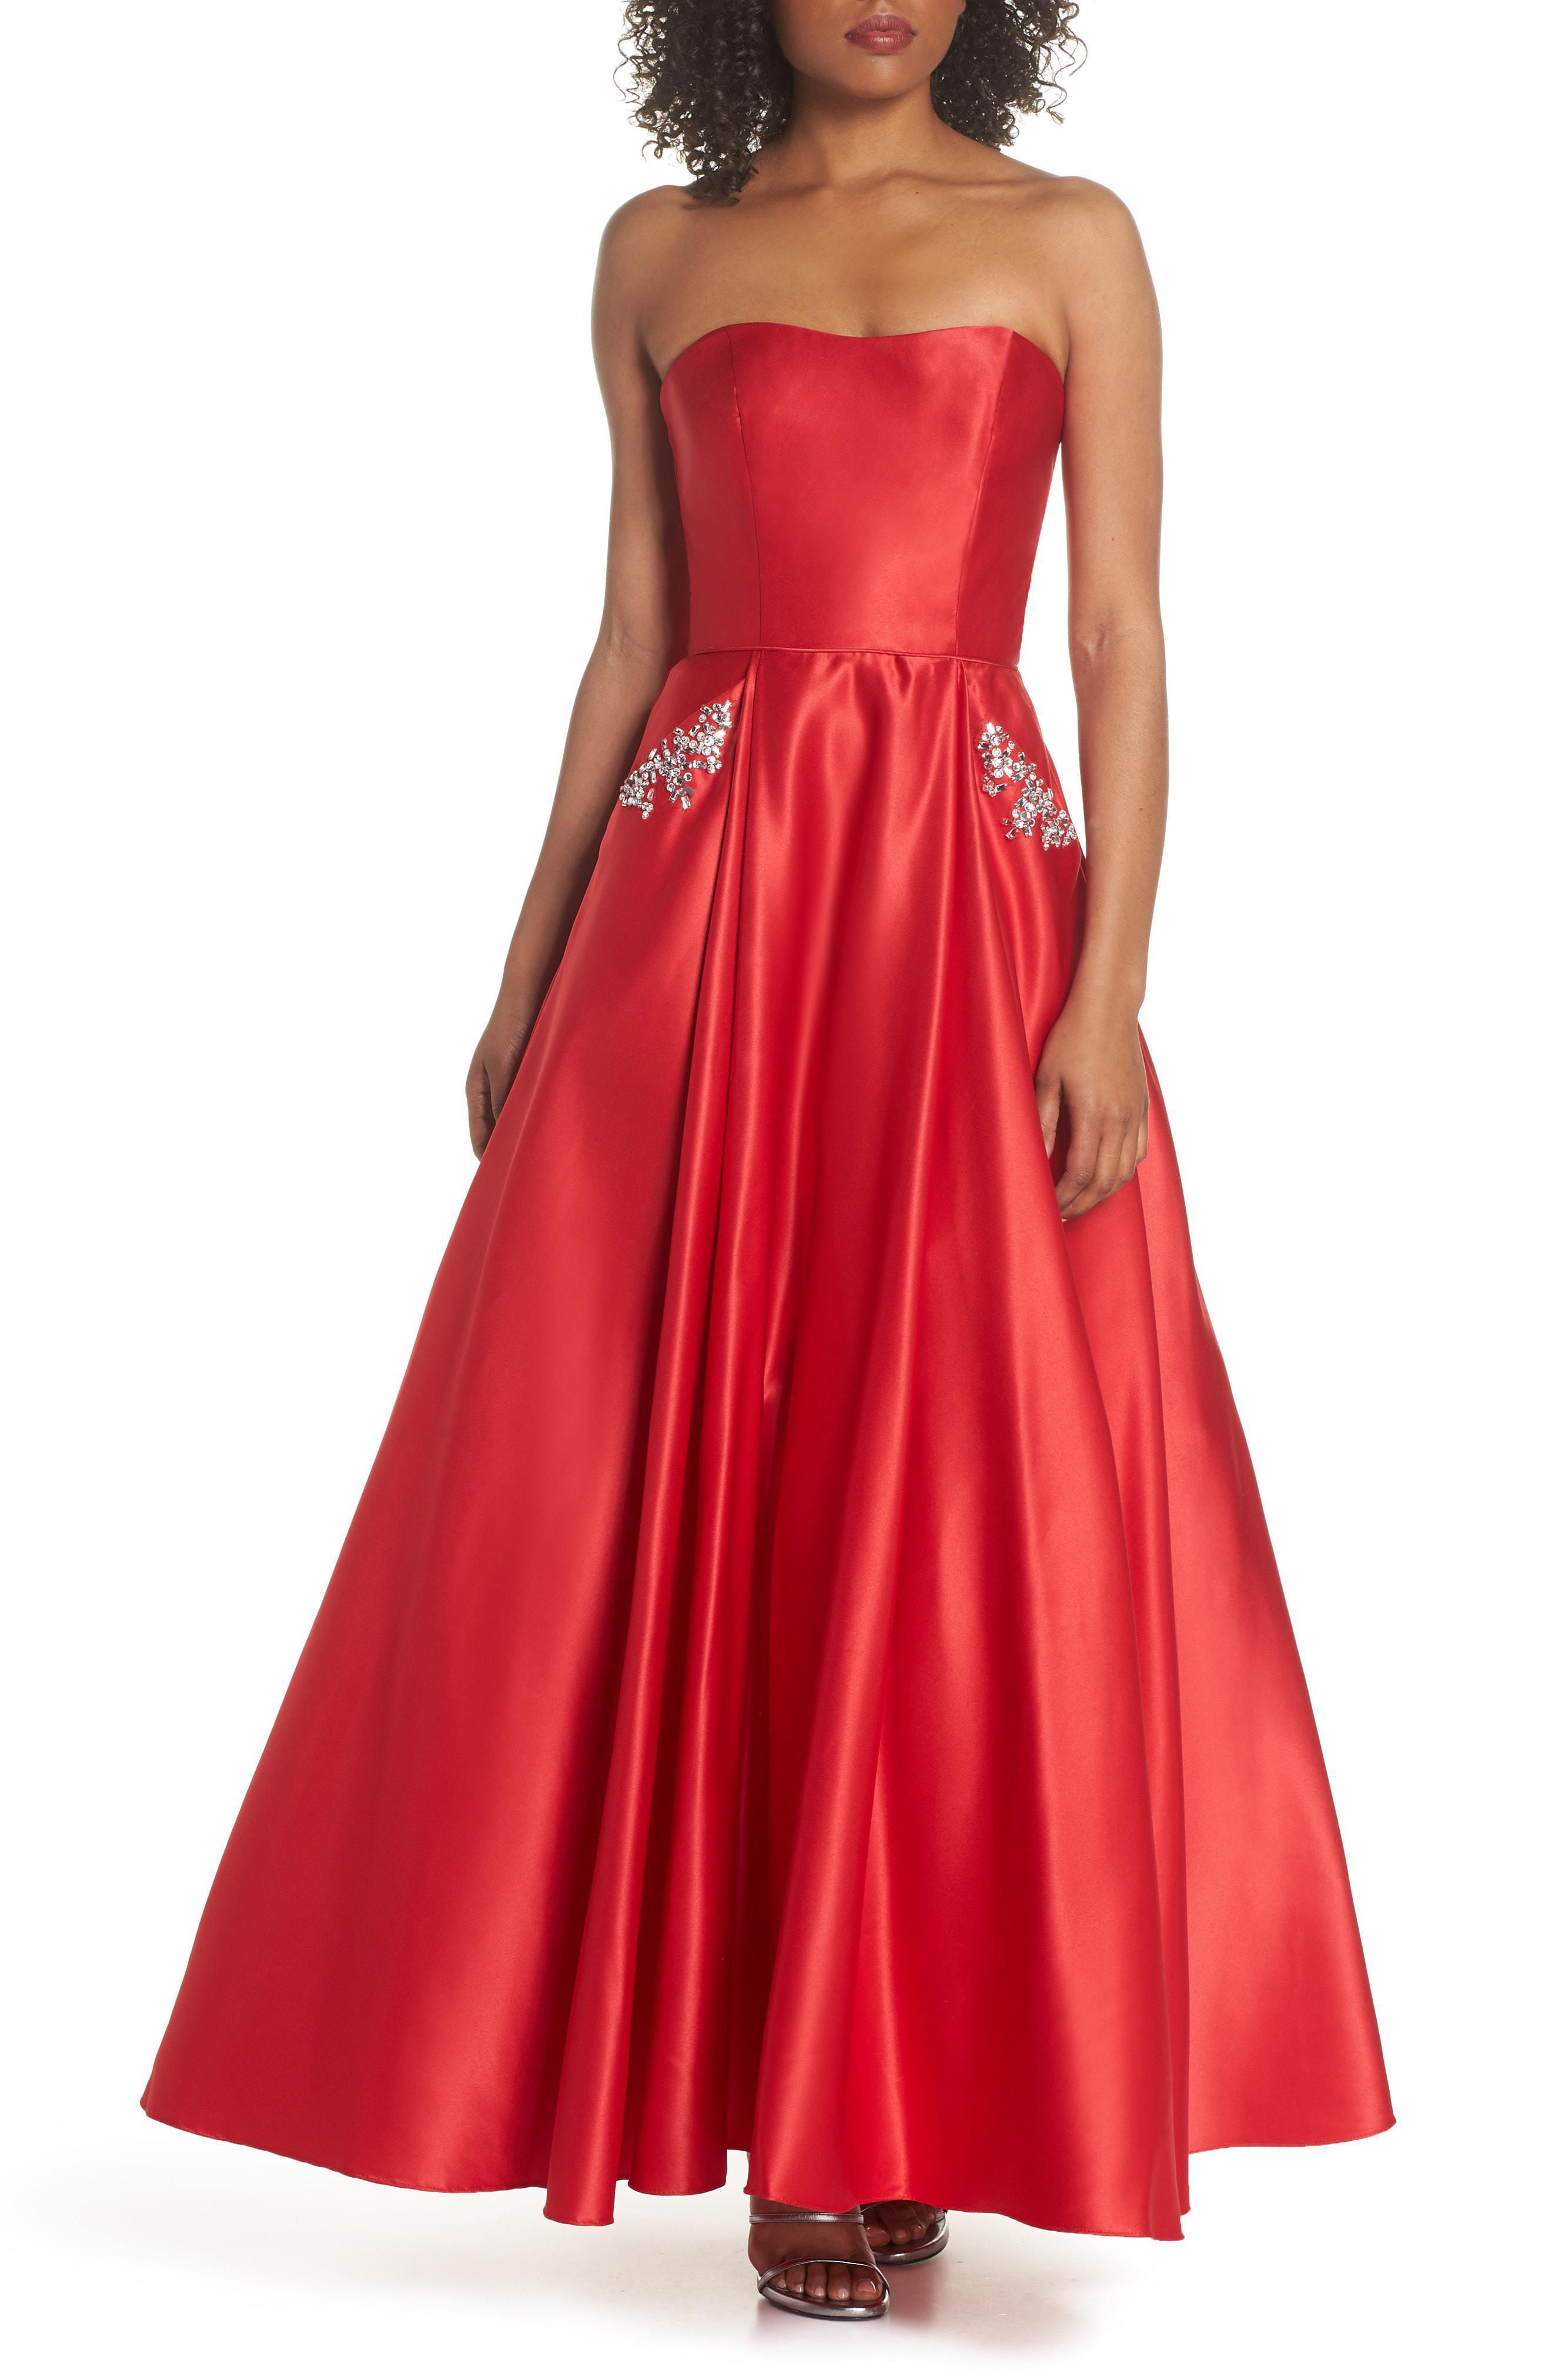 2508ac60ec3 Lyst - Blondie Nites Embellished Strapless Ballgown in Red